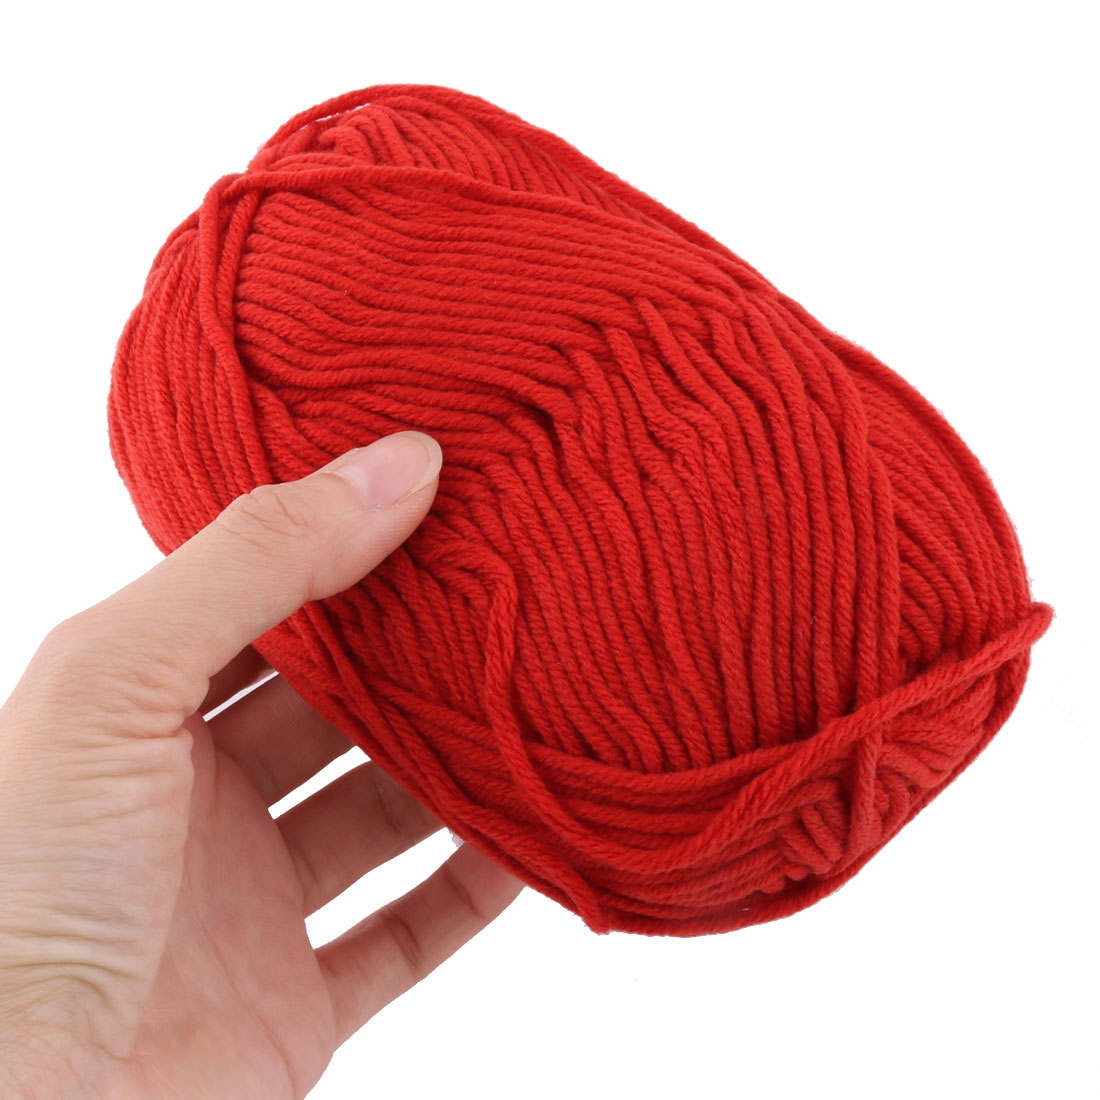 Gants-pull-Crochet-Artisanat-tissage-Fil-a-tricoter-2pcs-cordon-orange miniature 3